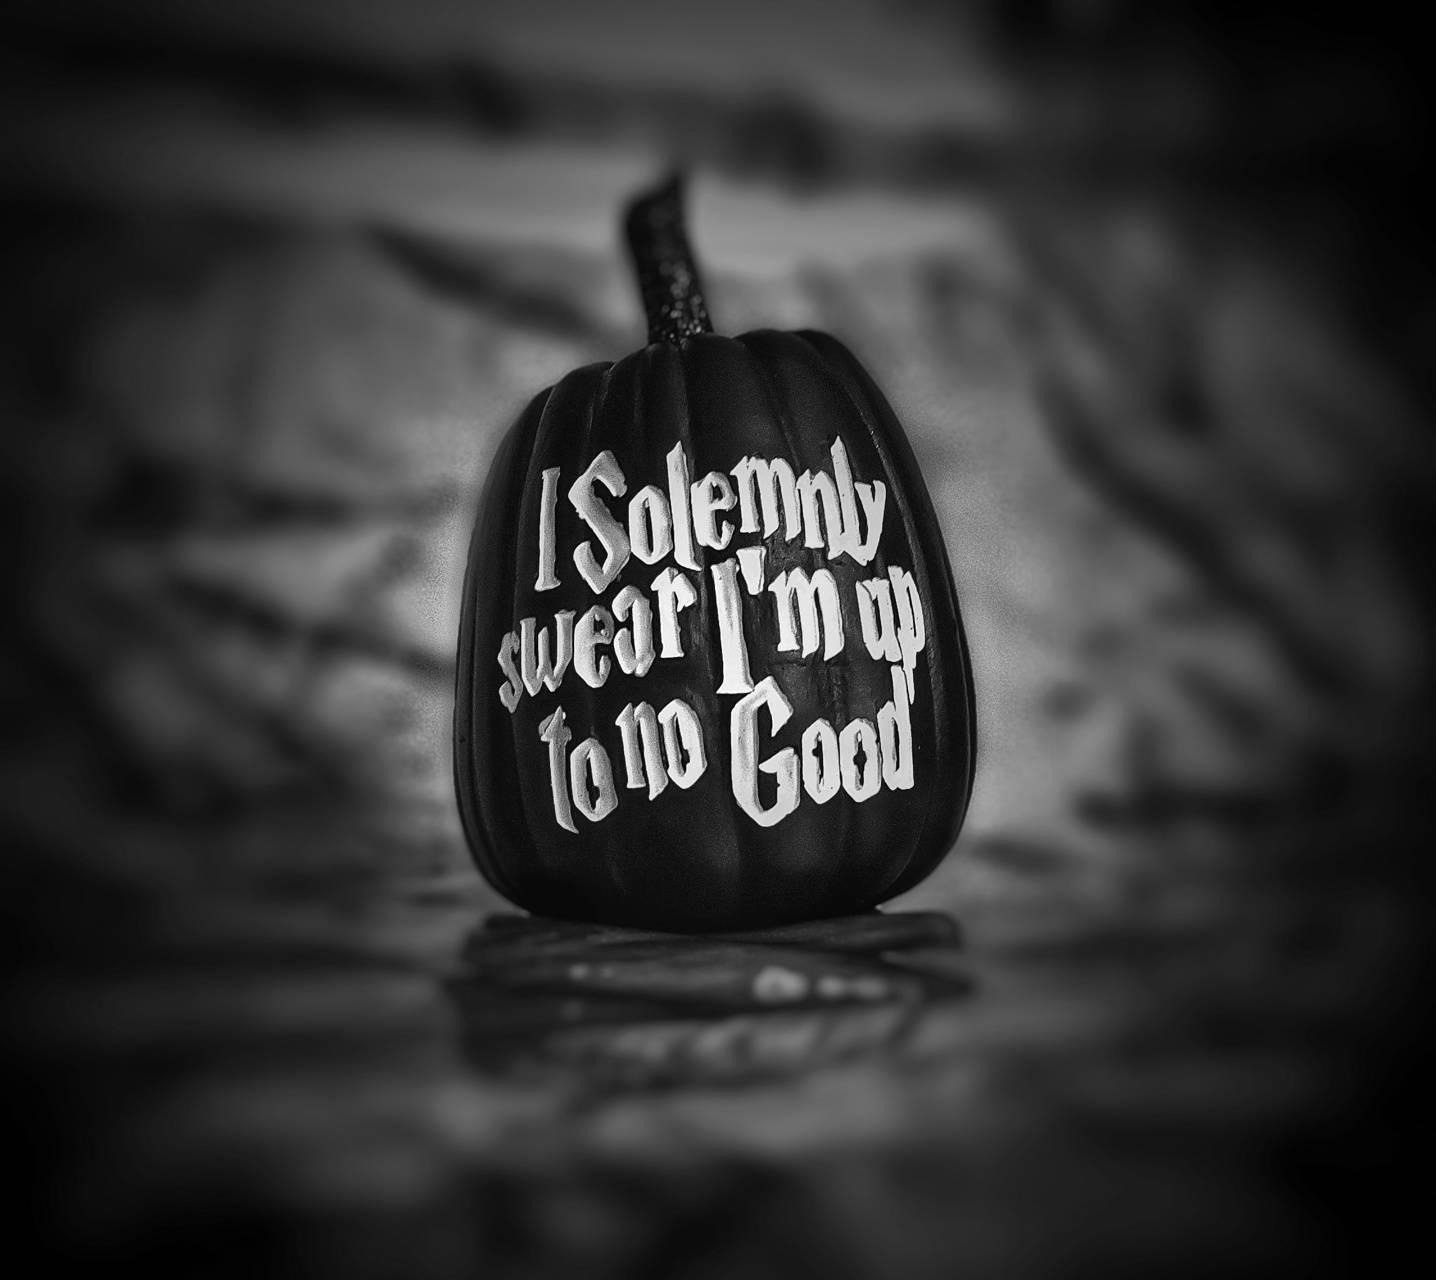 I solemnly swear